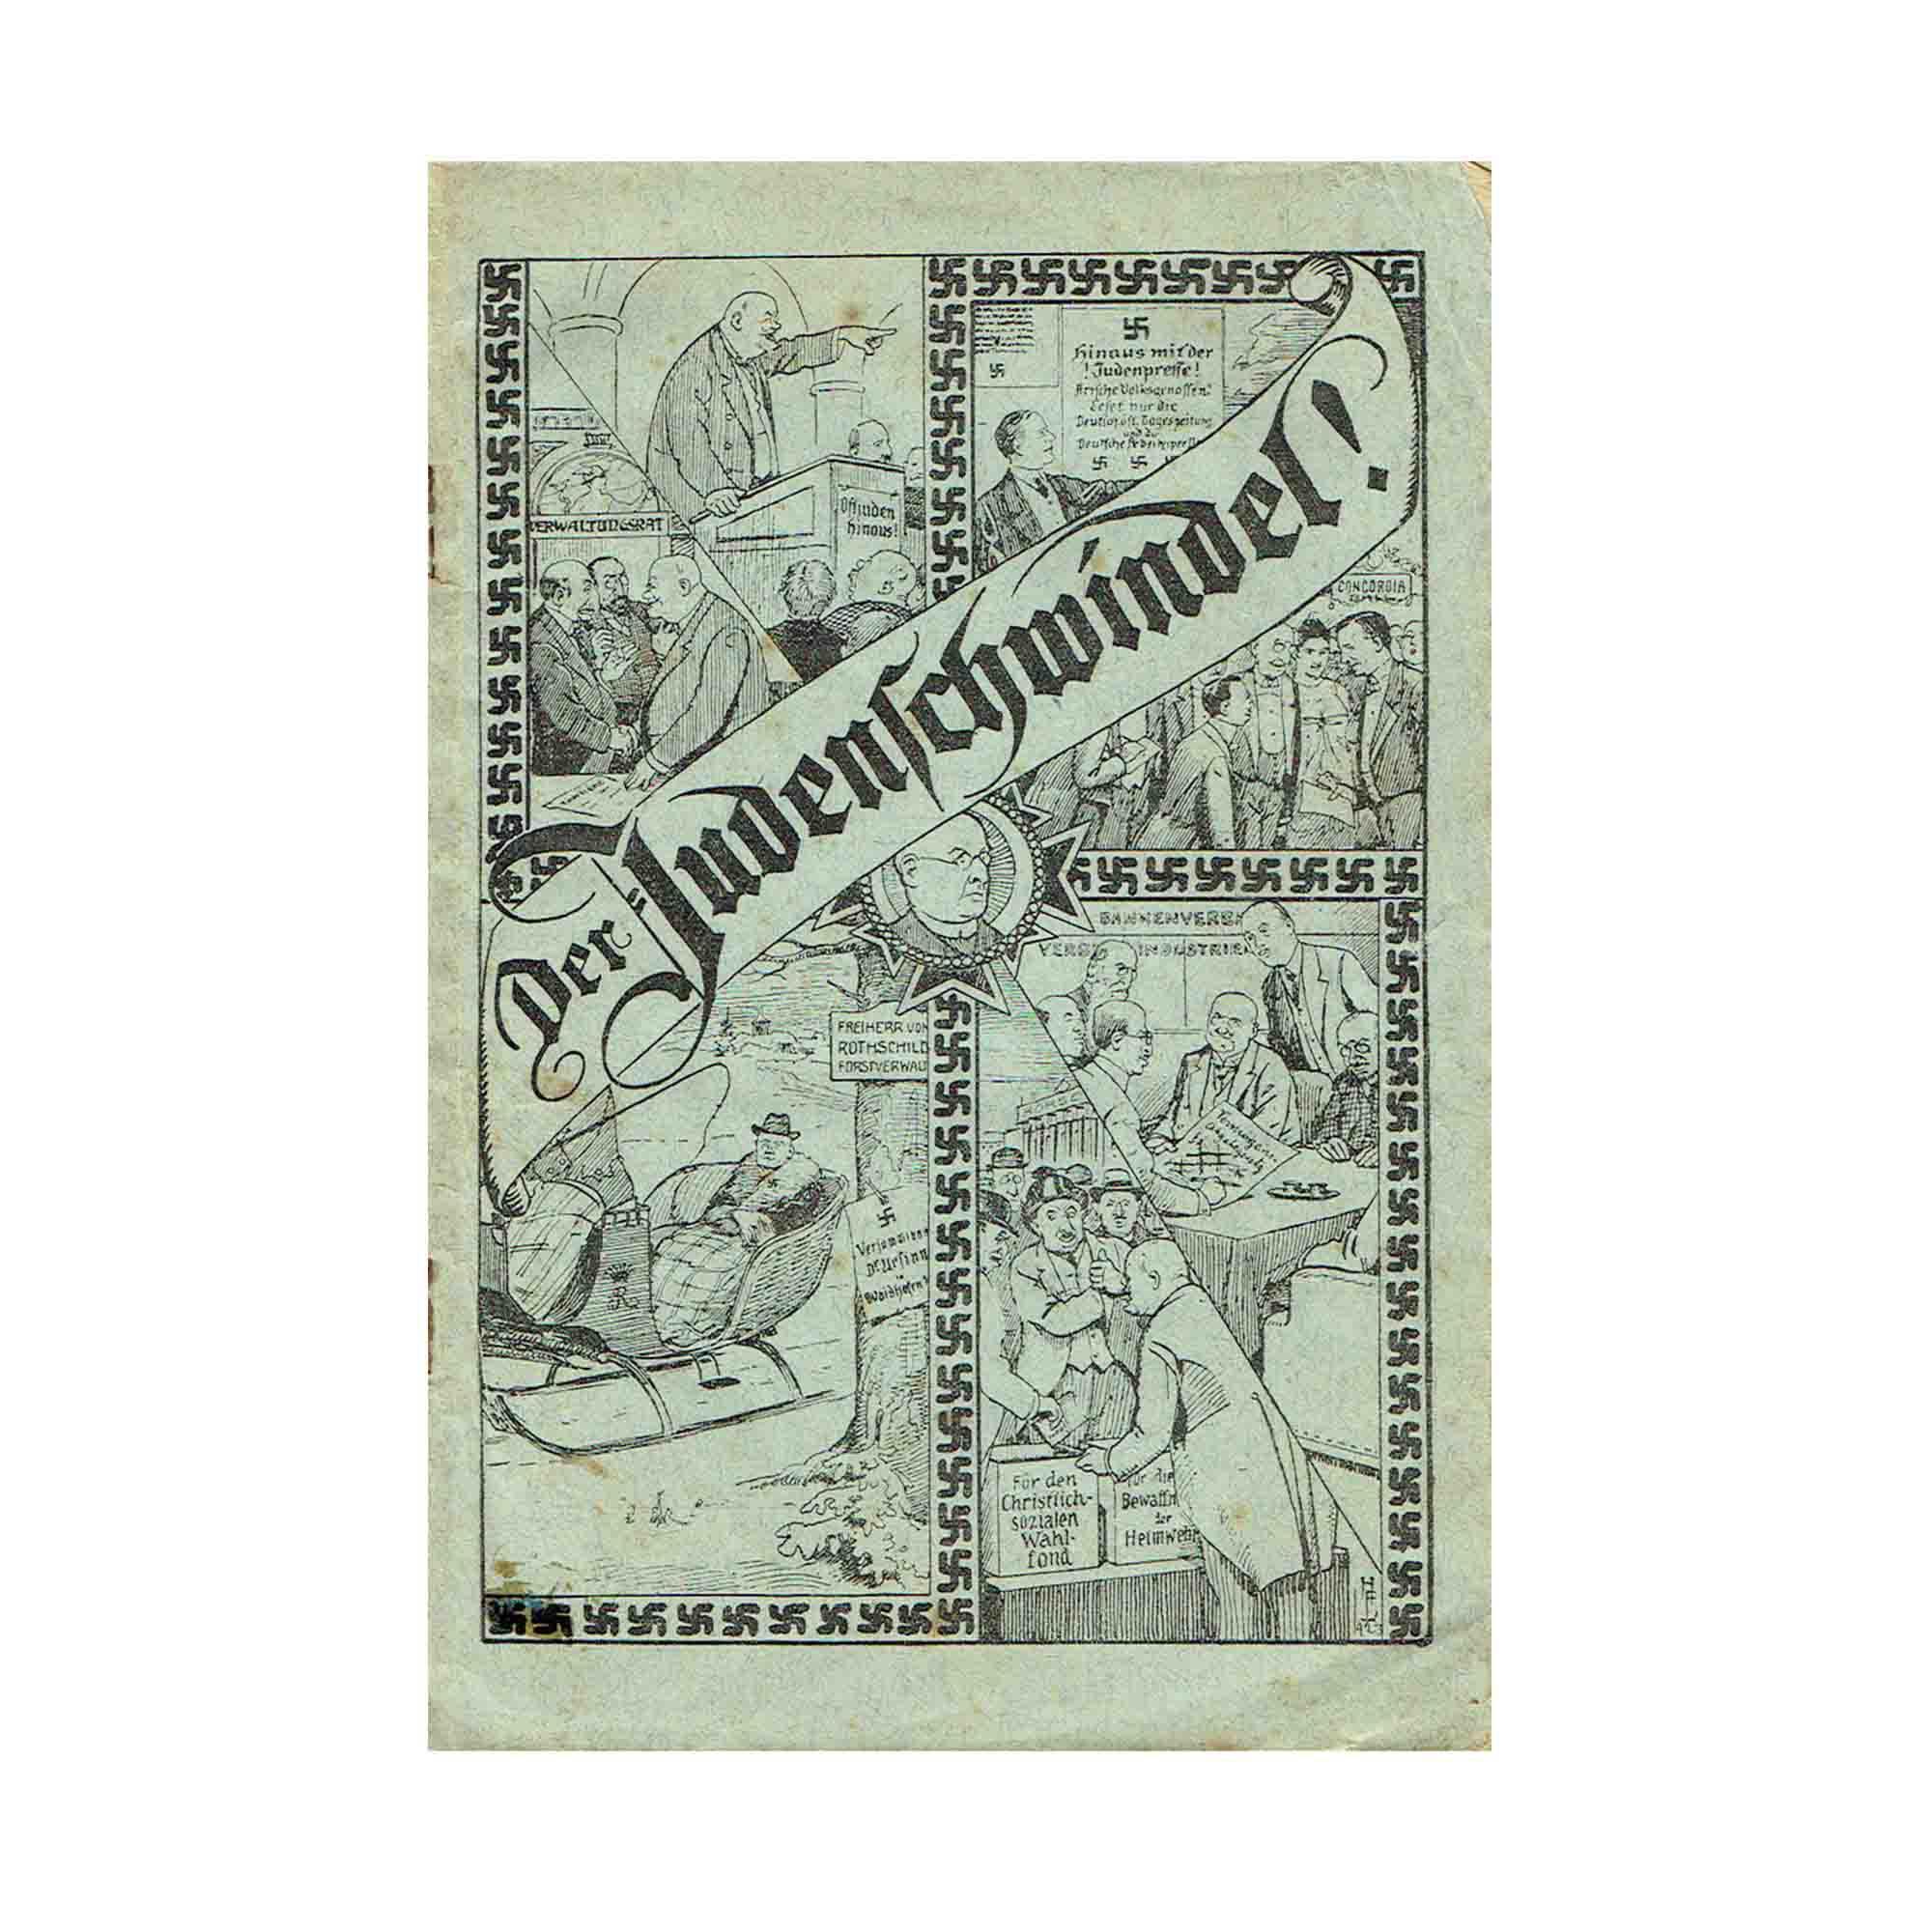 5304-Hinteregger-Judenschwindel-1923-N.jpeg